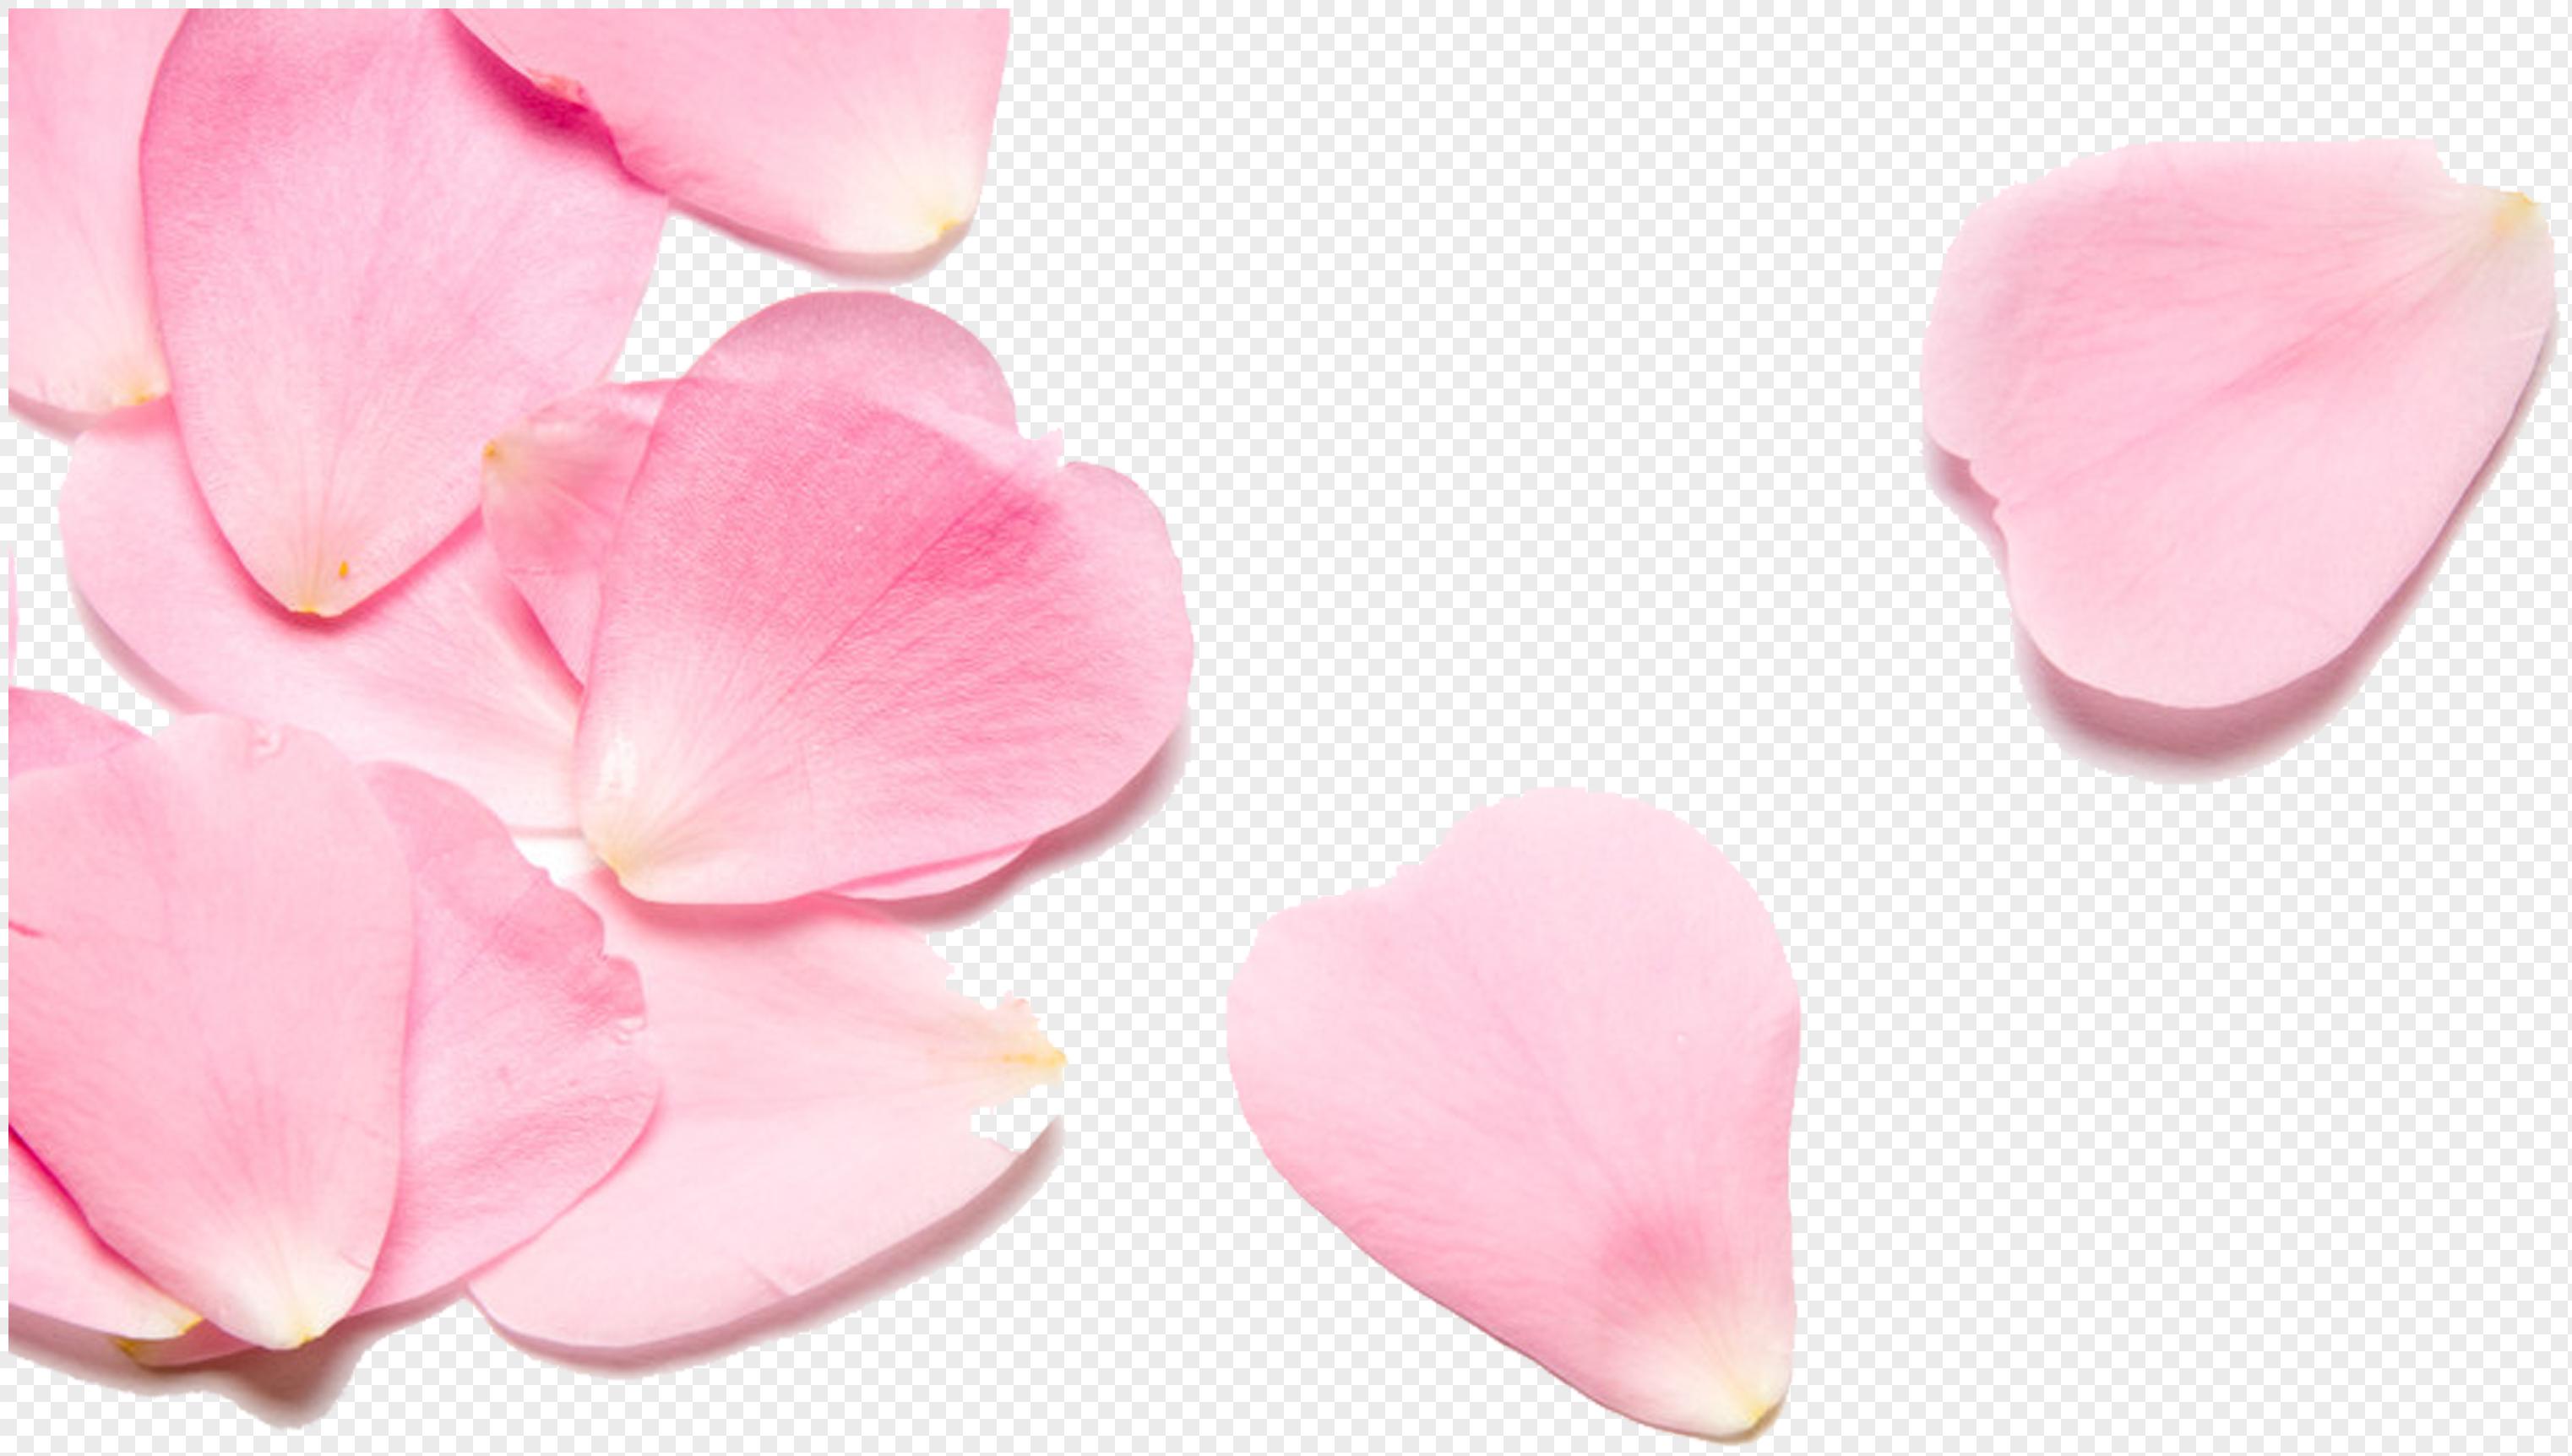 Pink Flower Petals Png Imagepicture Free Download 400407242lovepik